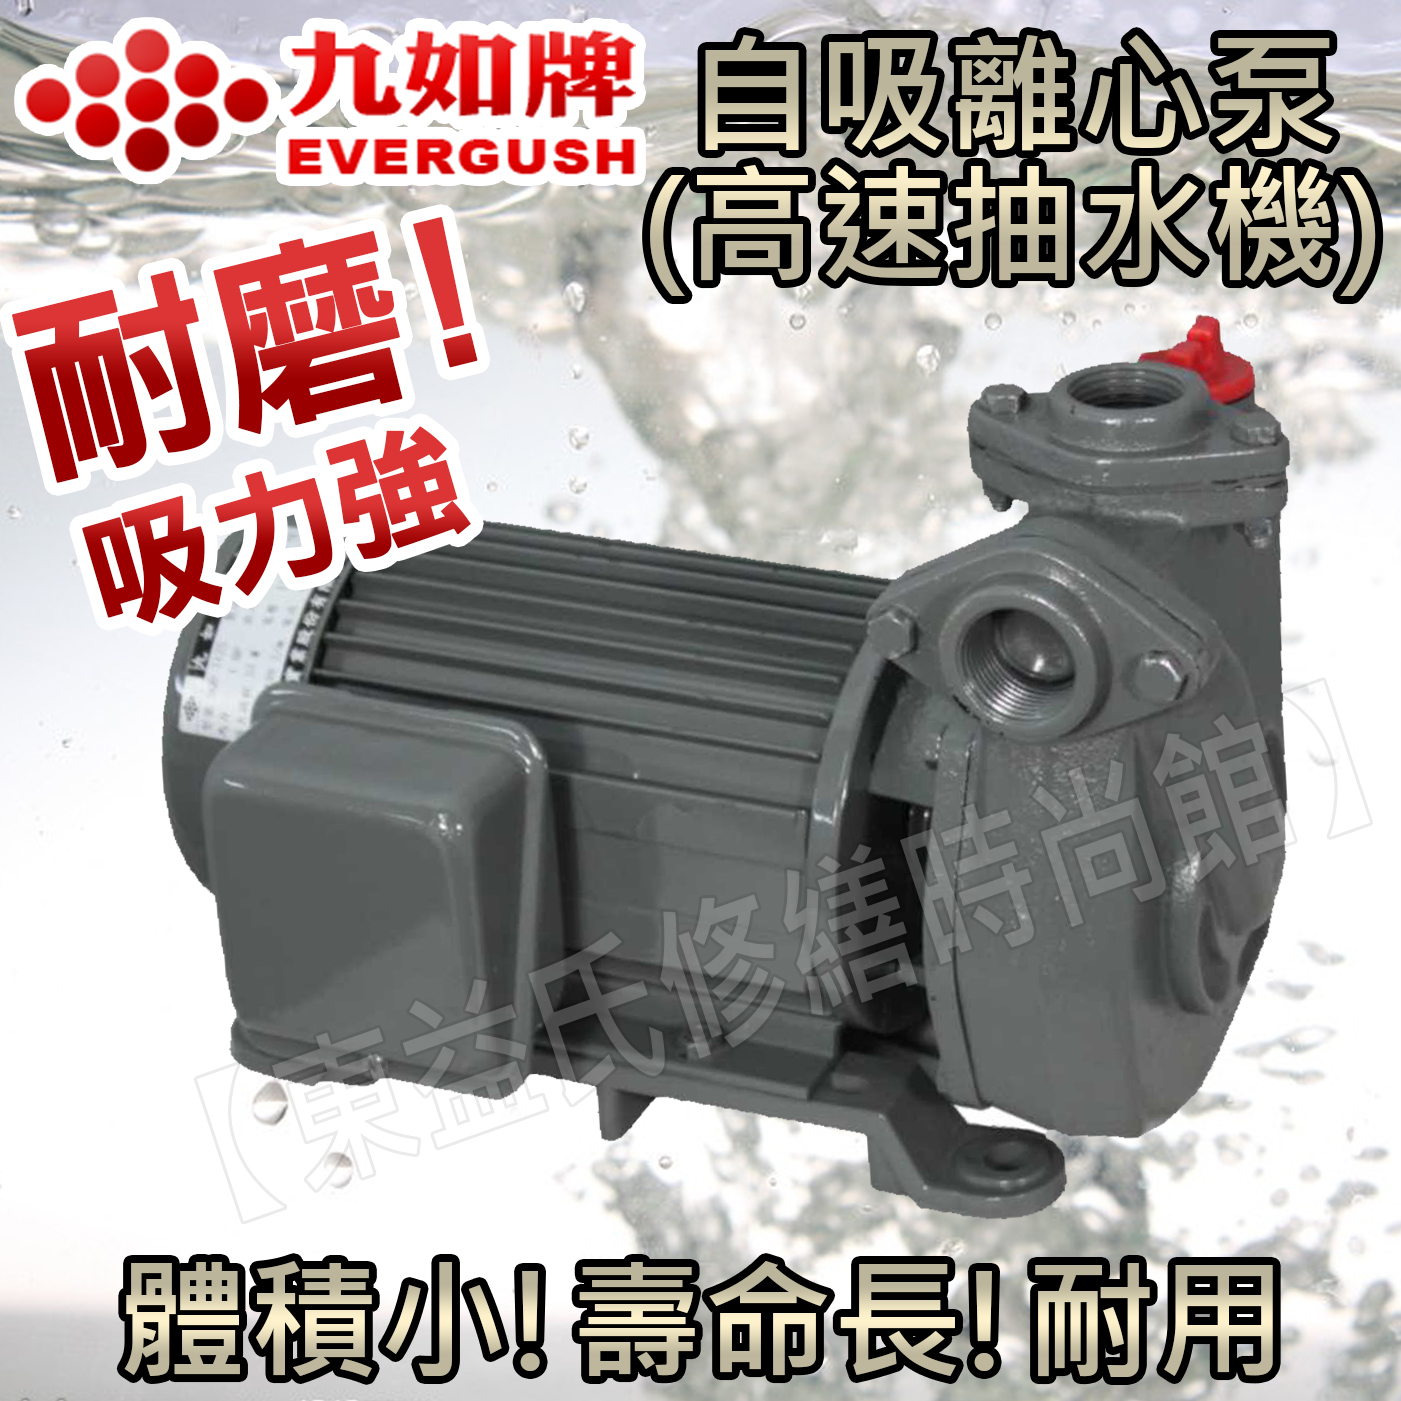 SQD-7125 九如牌1 HP 高速抽水馬達 110V/220V通用 體積小 壽命長 【東益氏】售 大井牌 抽水馬達